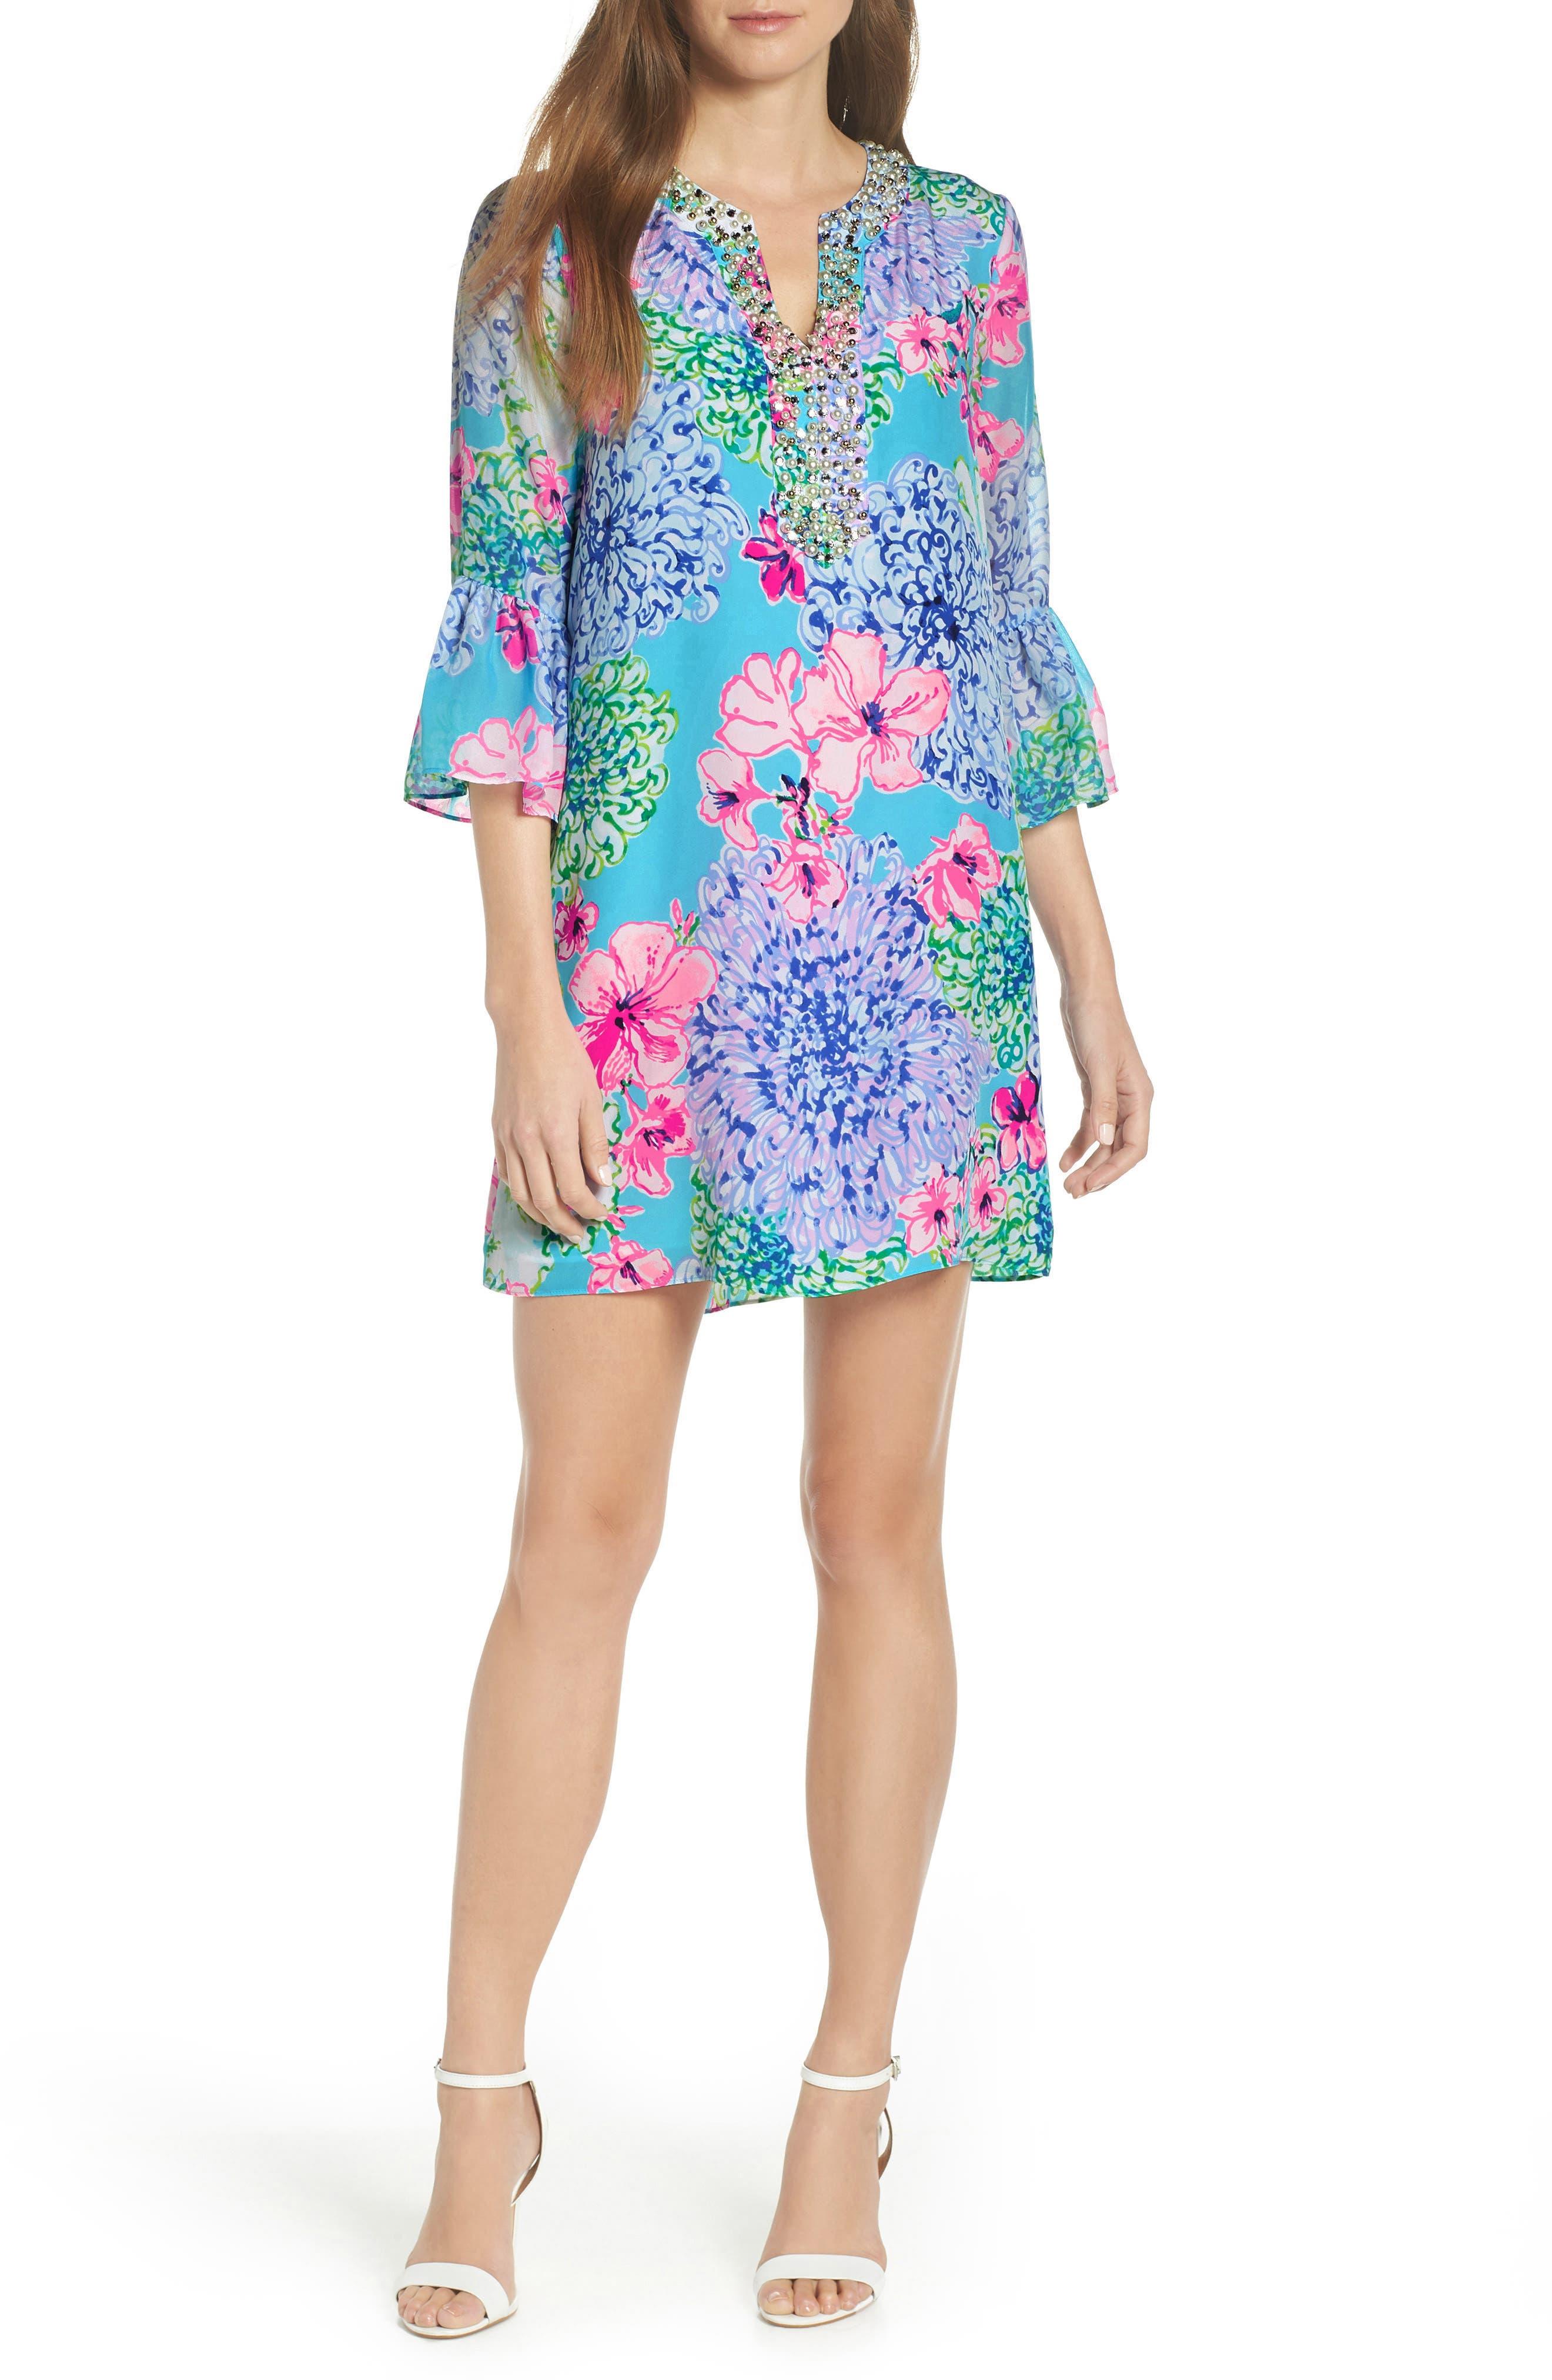 Lilly Pulitzer Elenora Floral Embellished Silk Dress